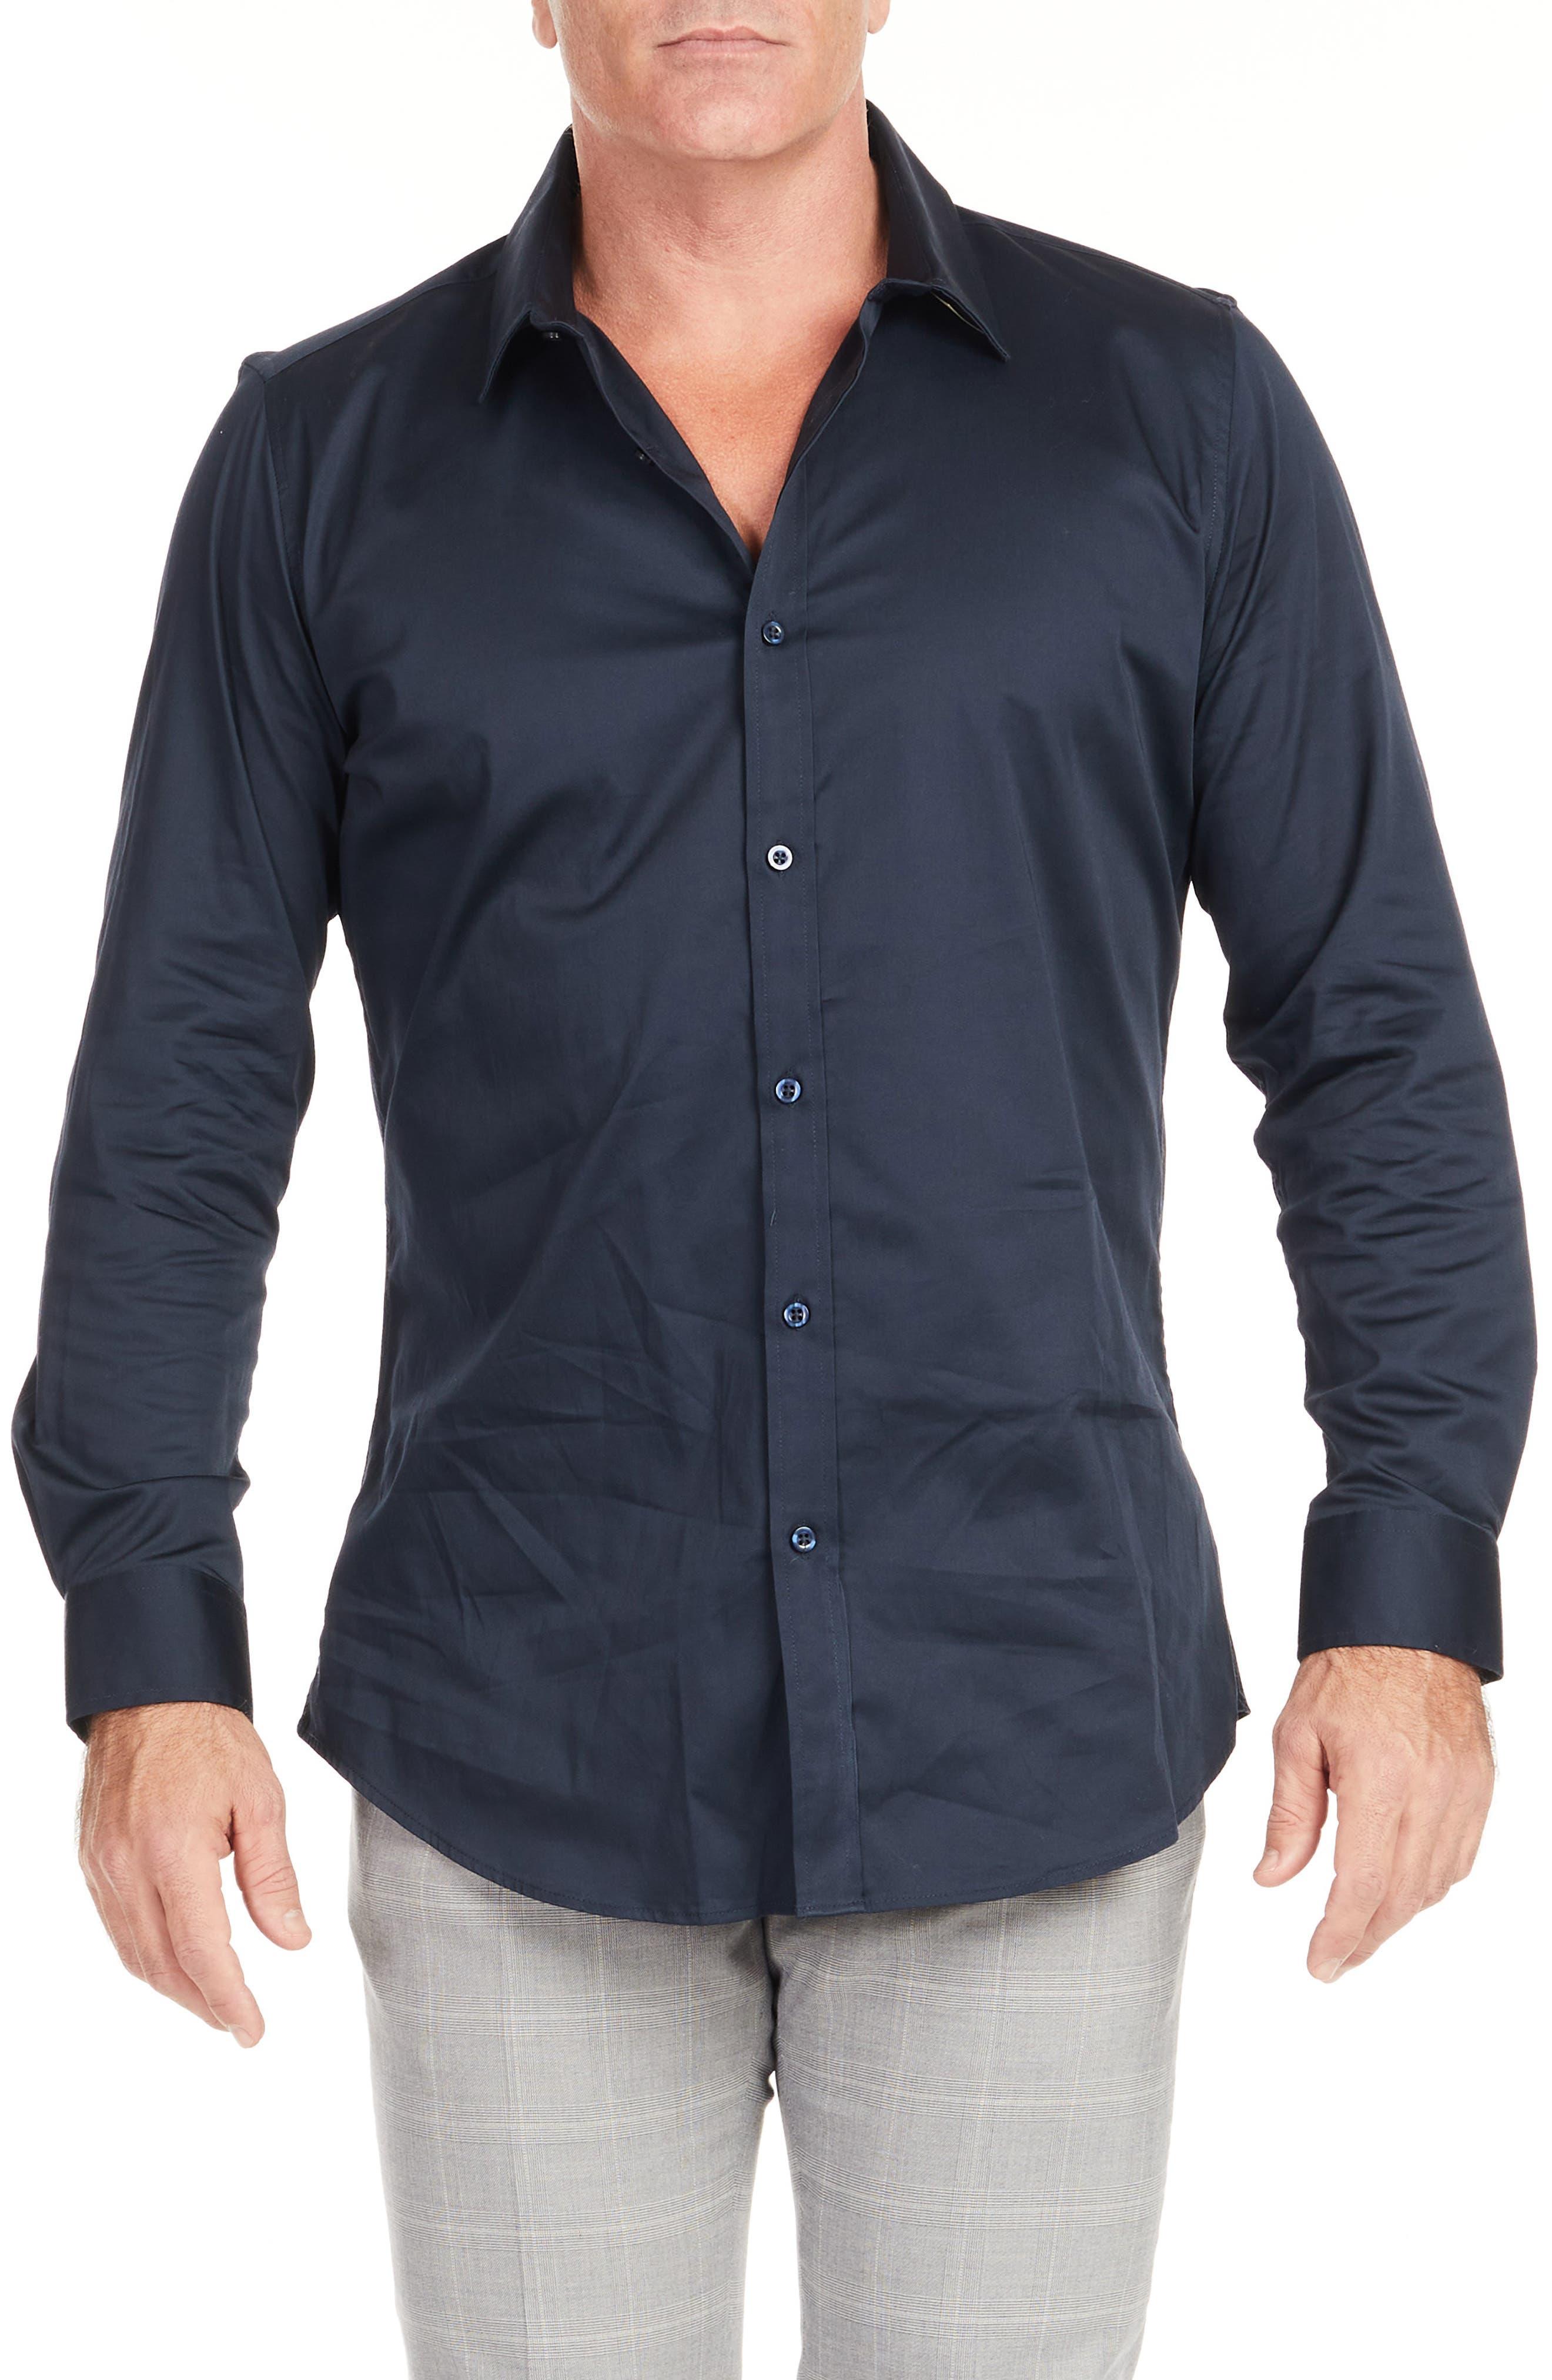 Bahamas Regular Fit Stretch Button-Up Shirt